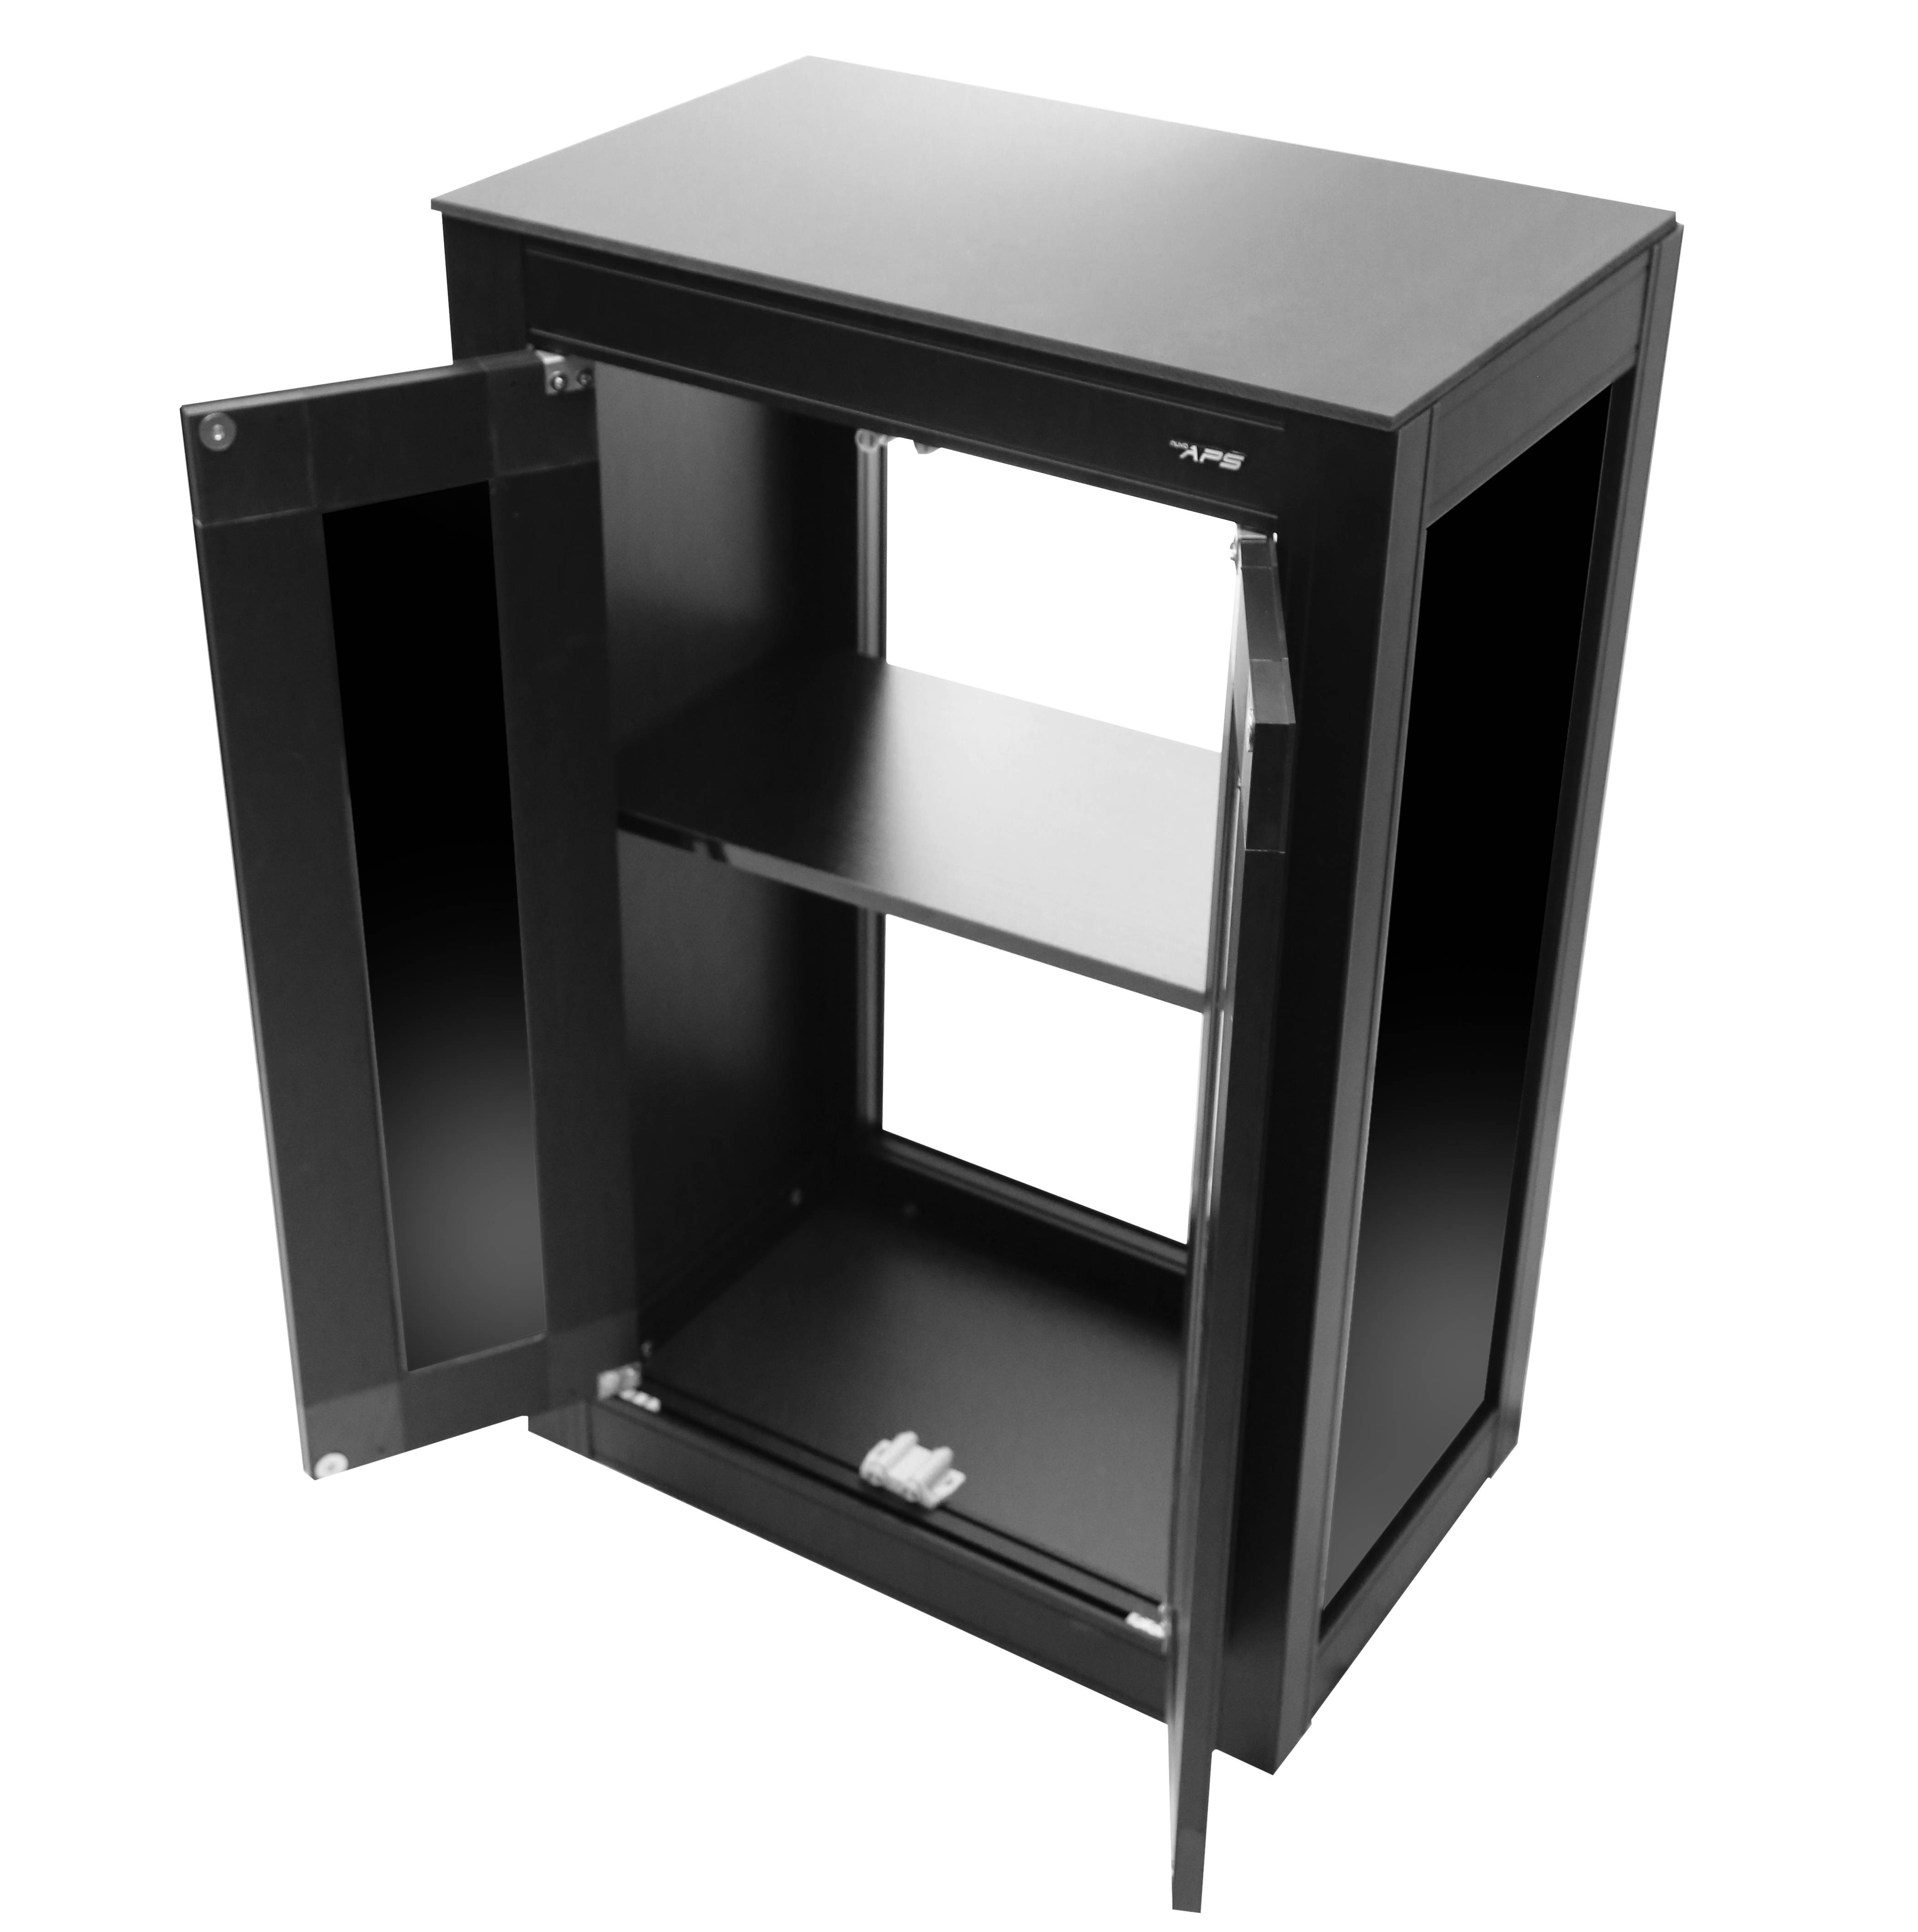 NUVO APS Aluminum Profile Series Stand